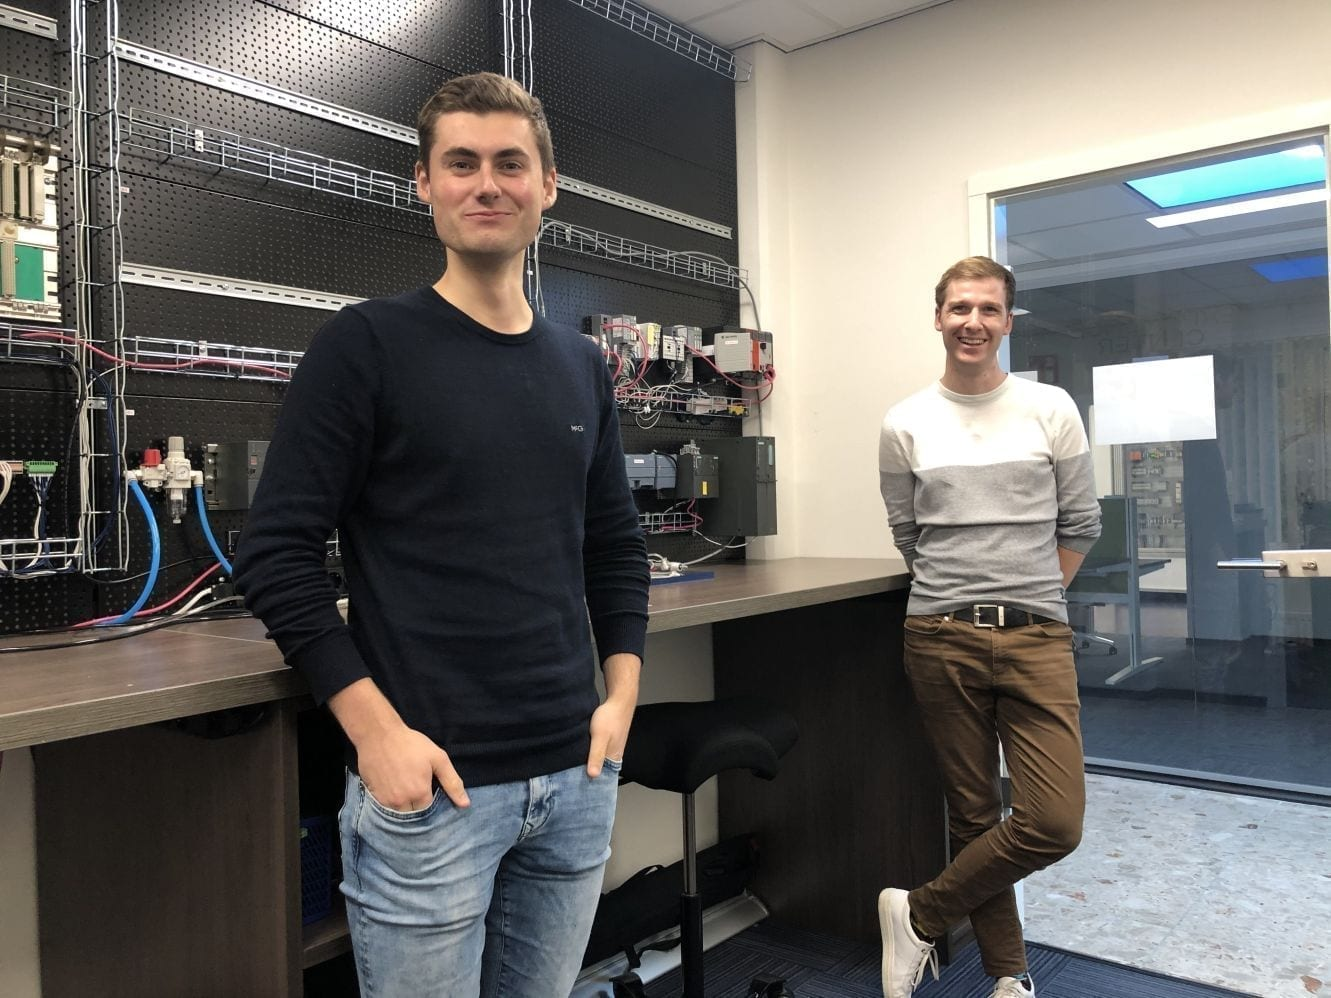 Johan Hemrica en Kelvin Sweere beginnen vandaag bij MA-IT